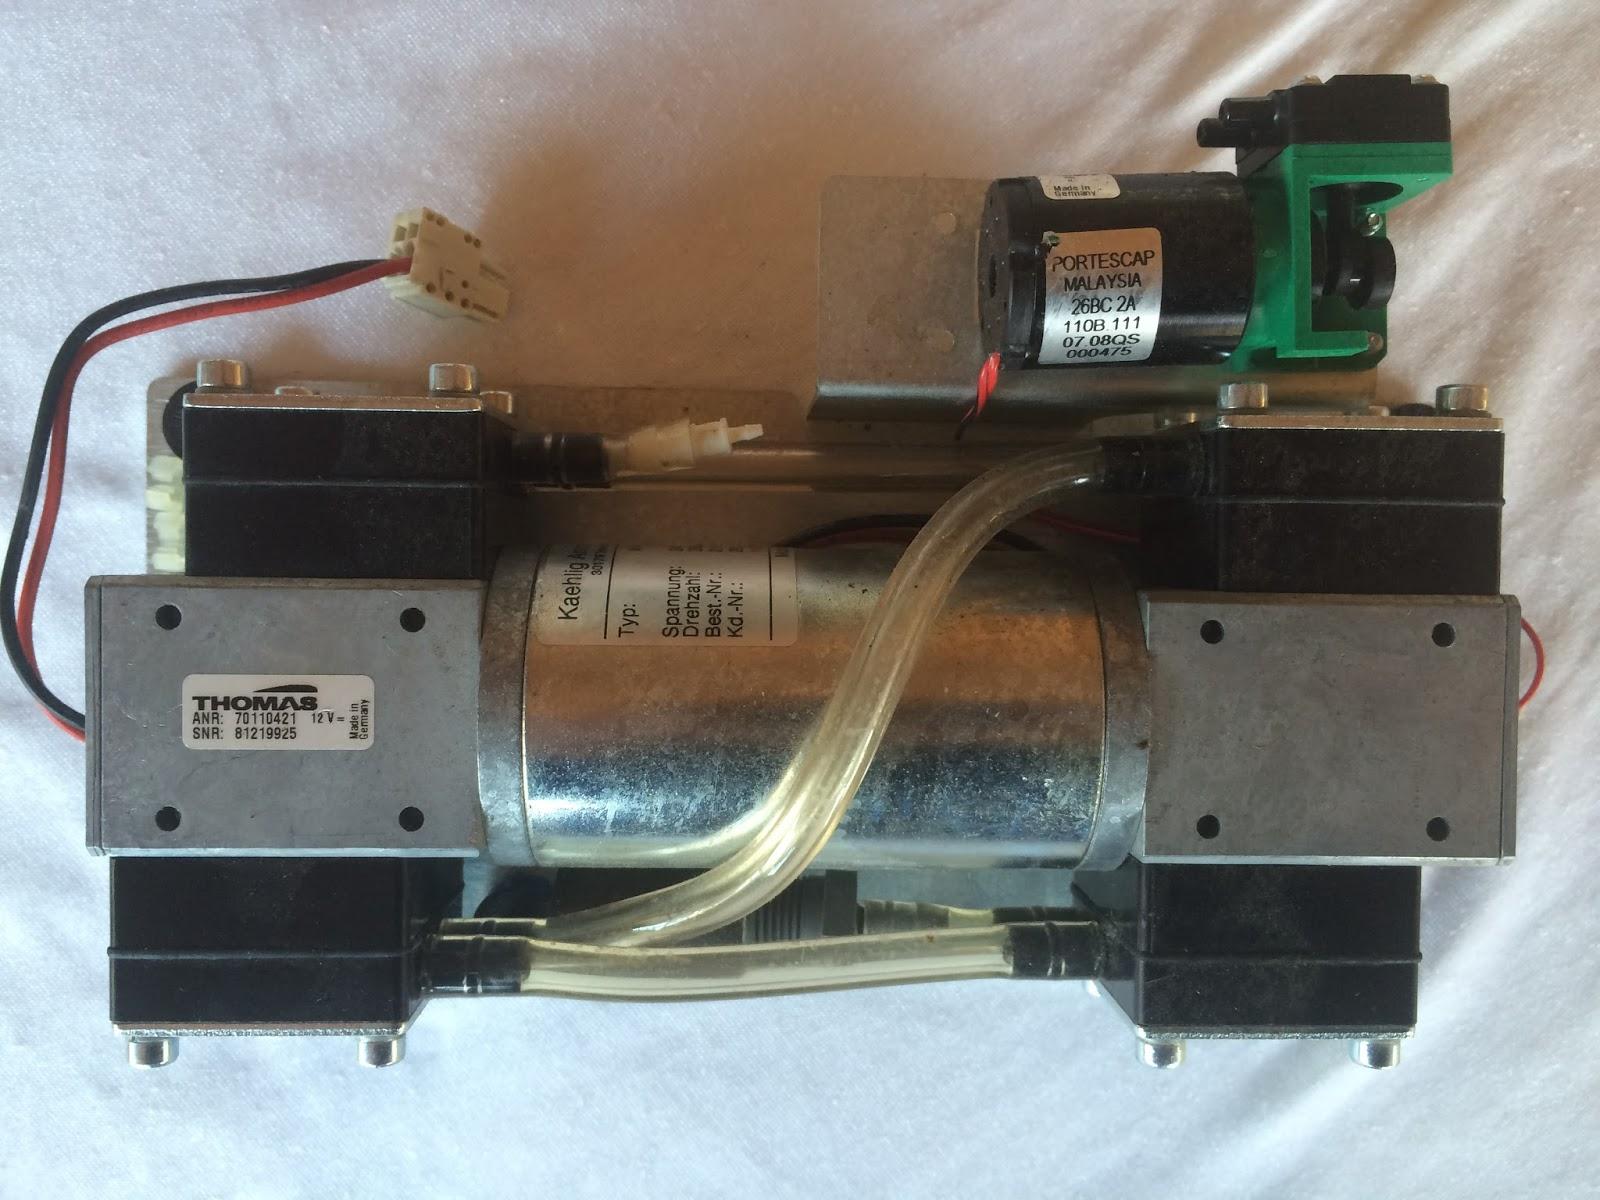 Kaehlig antriebstechnik brushed dc motor permanent magnet for Surplus permanent magnet dc motors